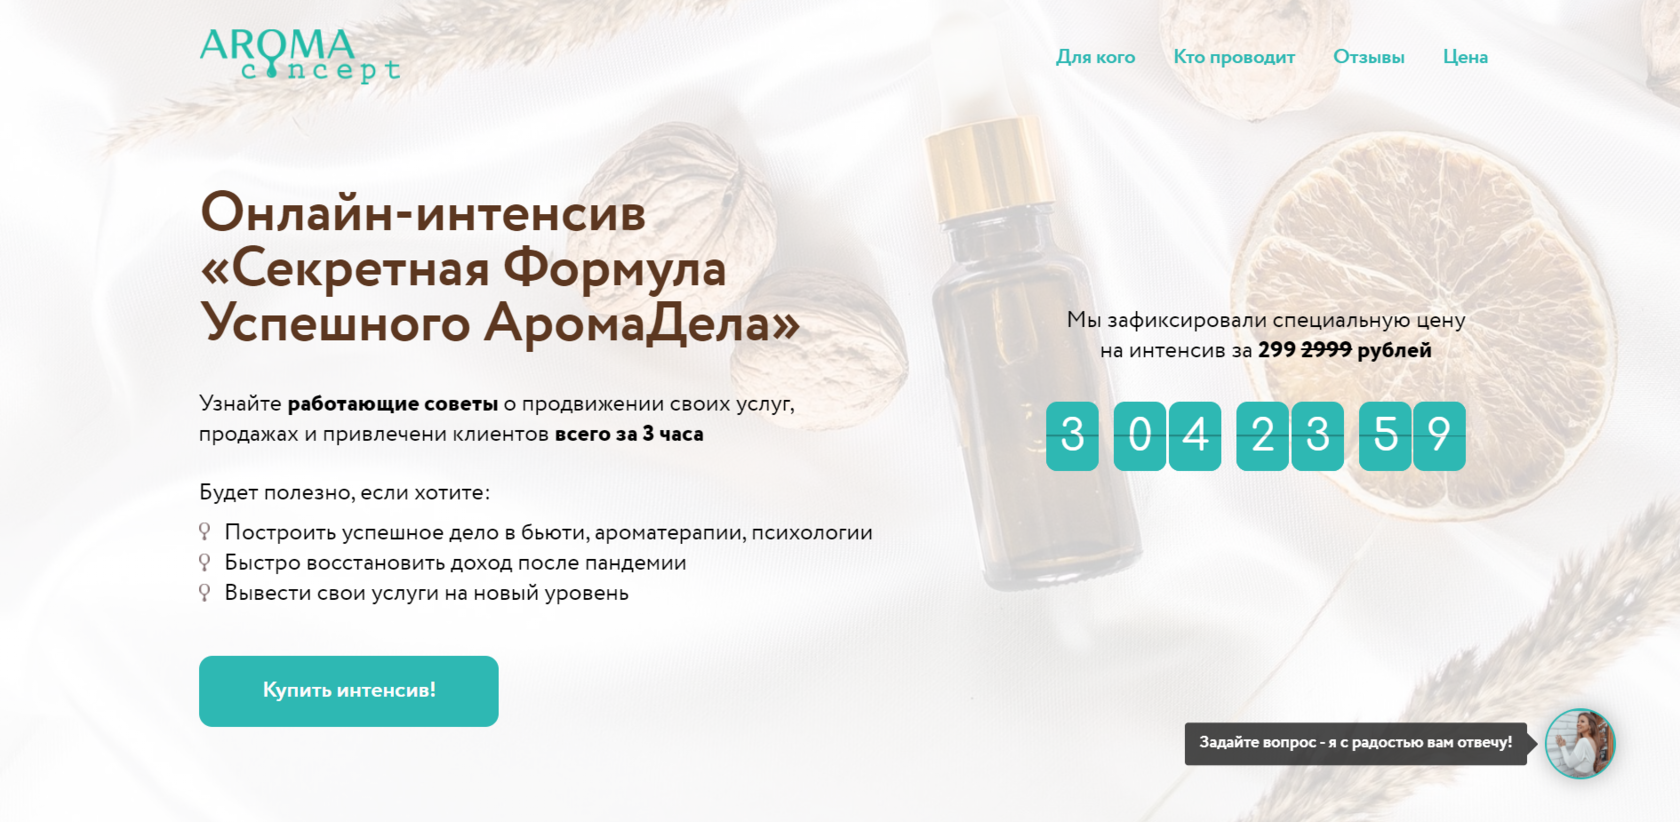 aromaconcept.ru